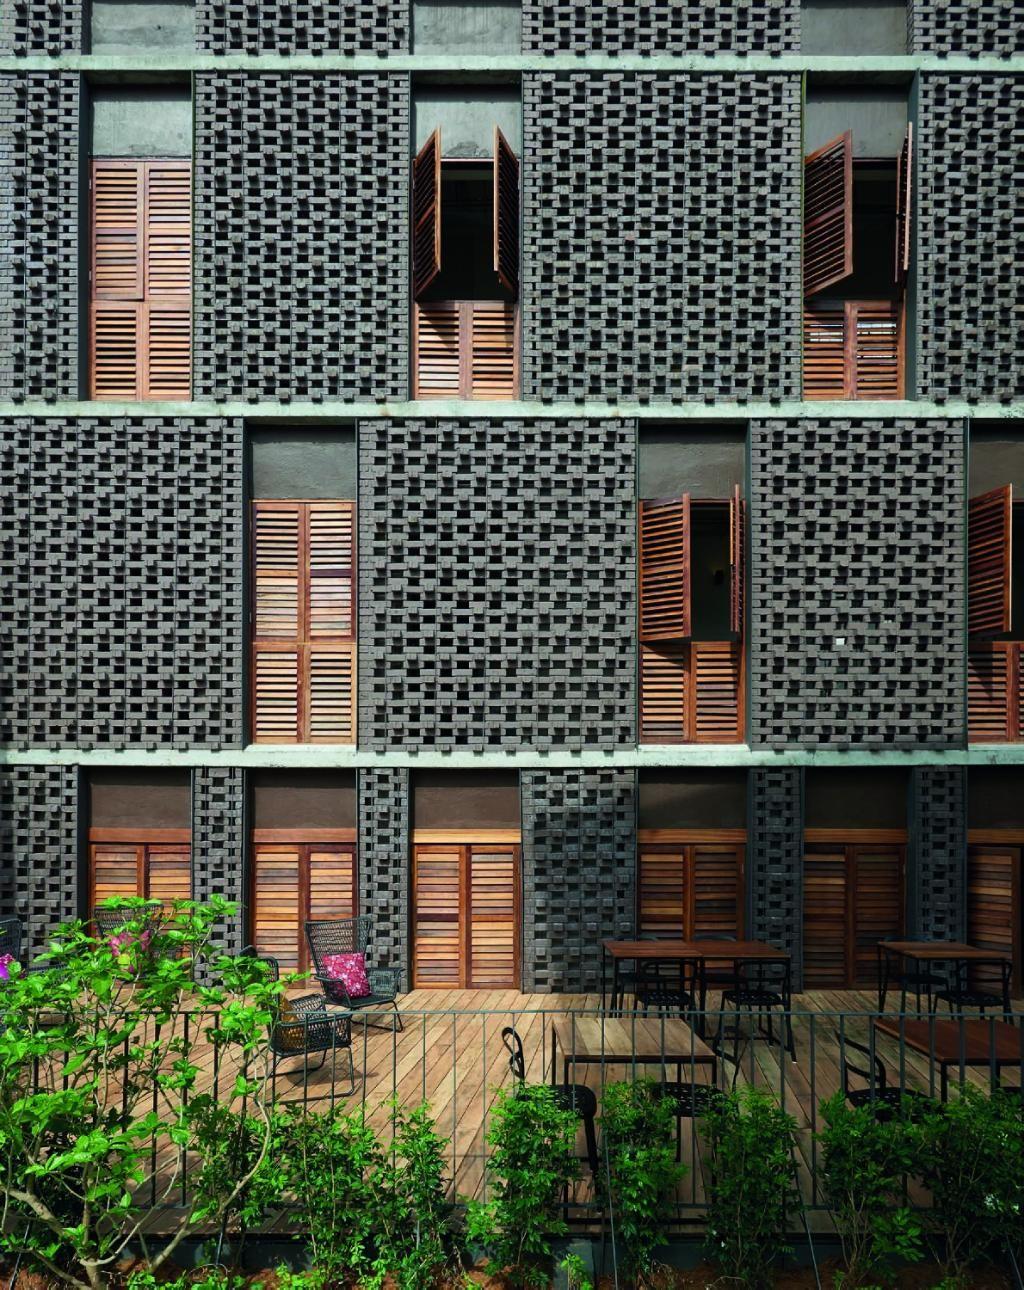 lantern hotel south east i 39 m coming pinterest facciate architettura e mattoni. Black Bedroom Furniture Sets. Home Design Ideas